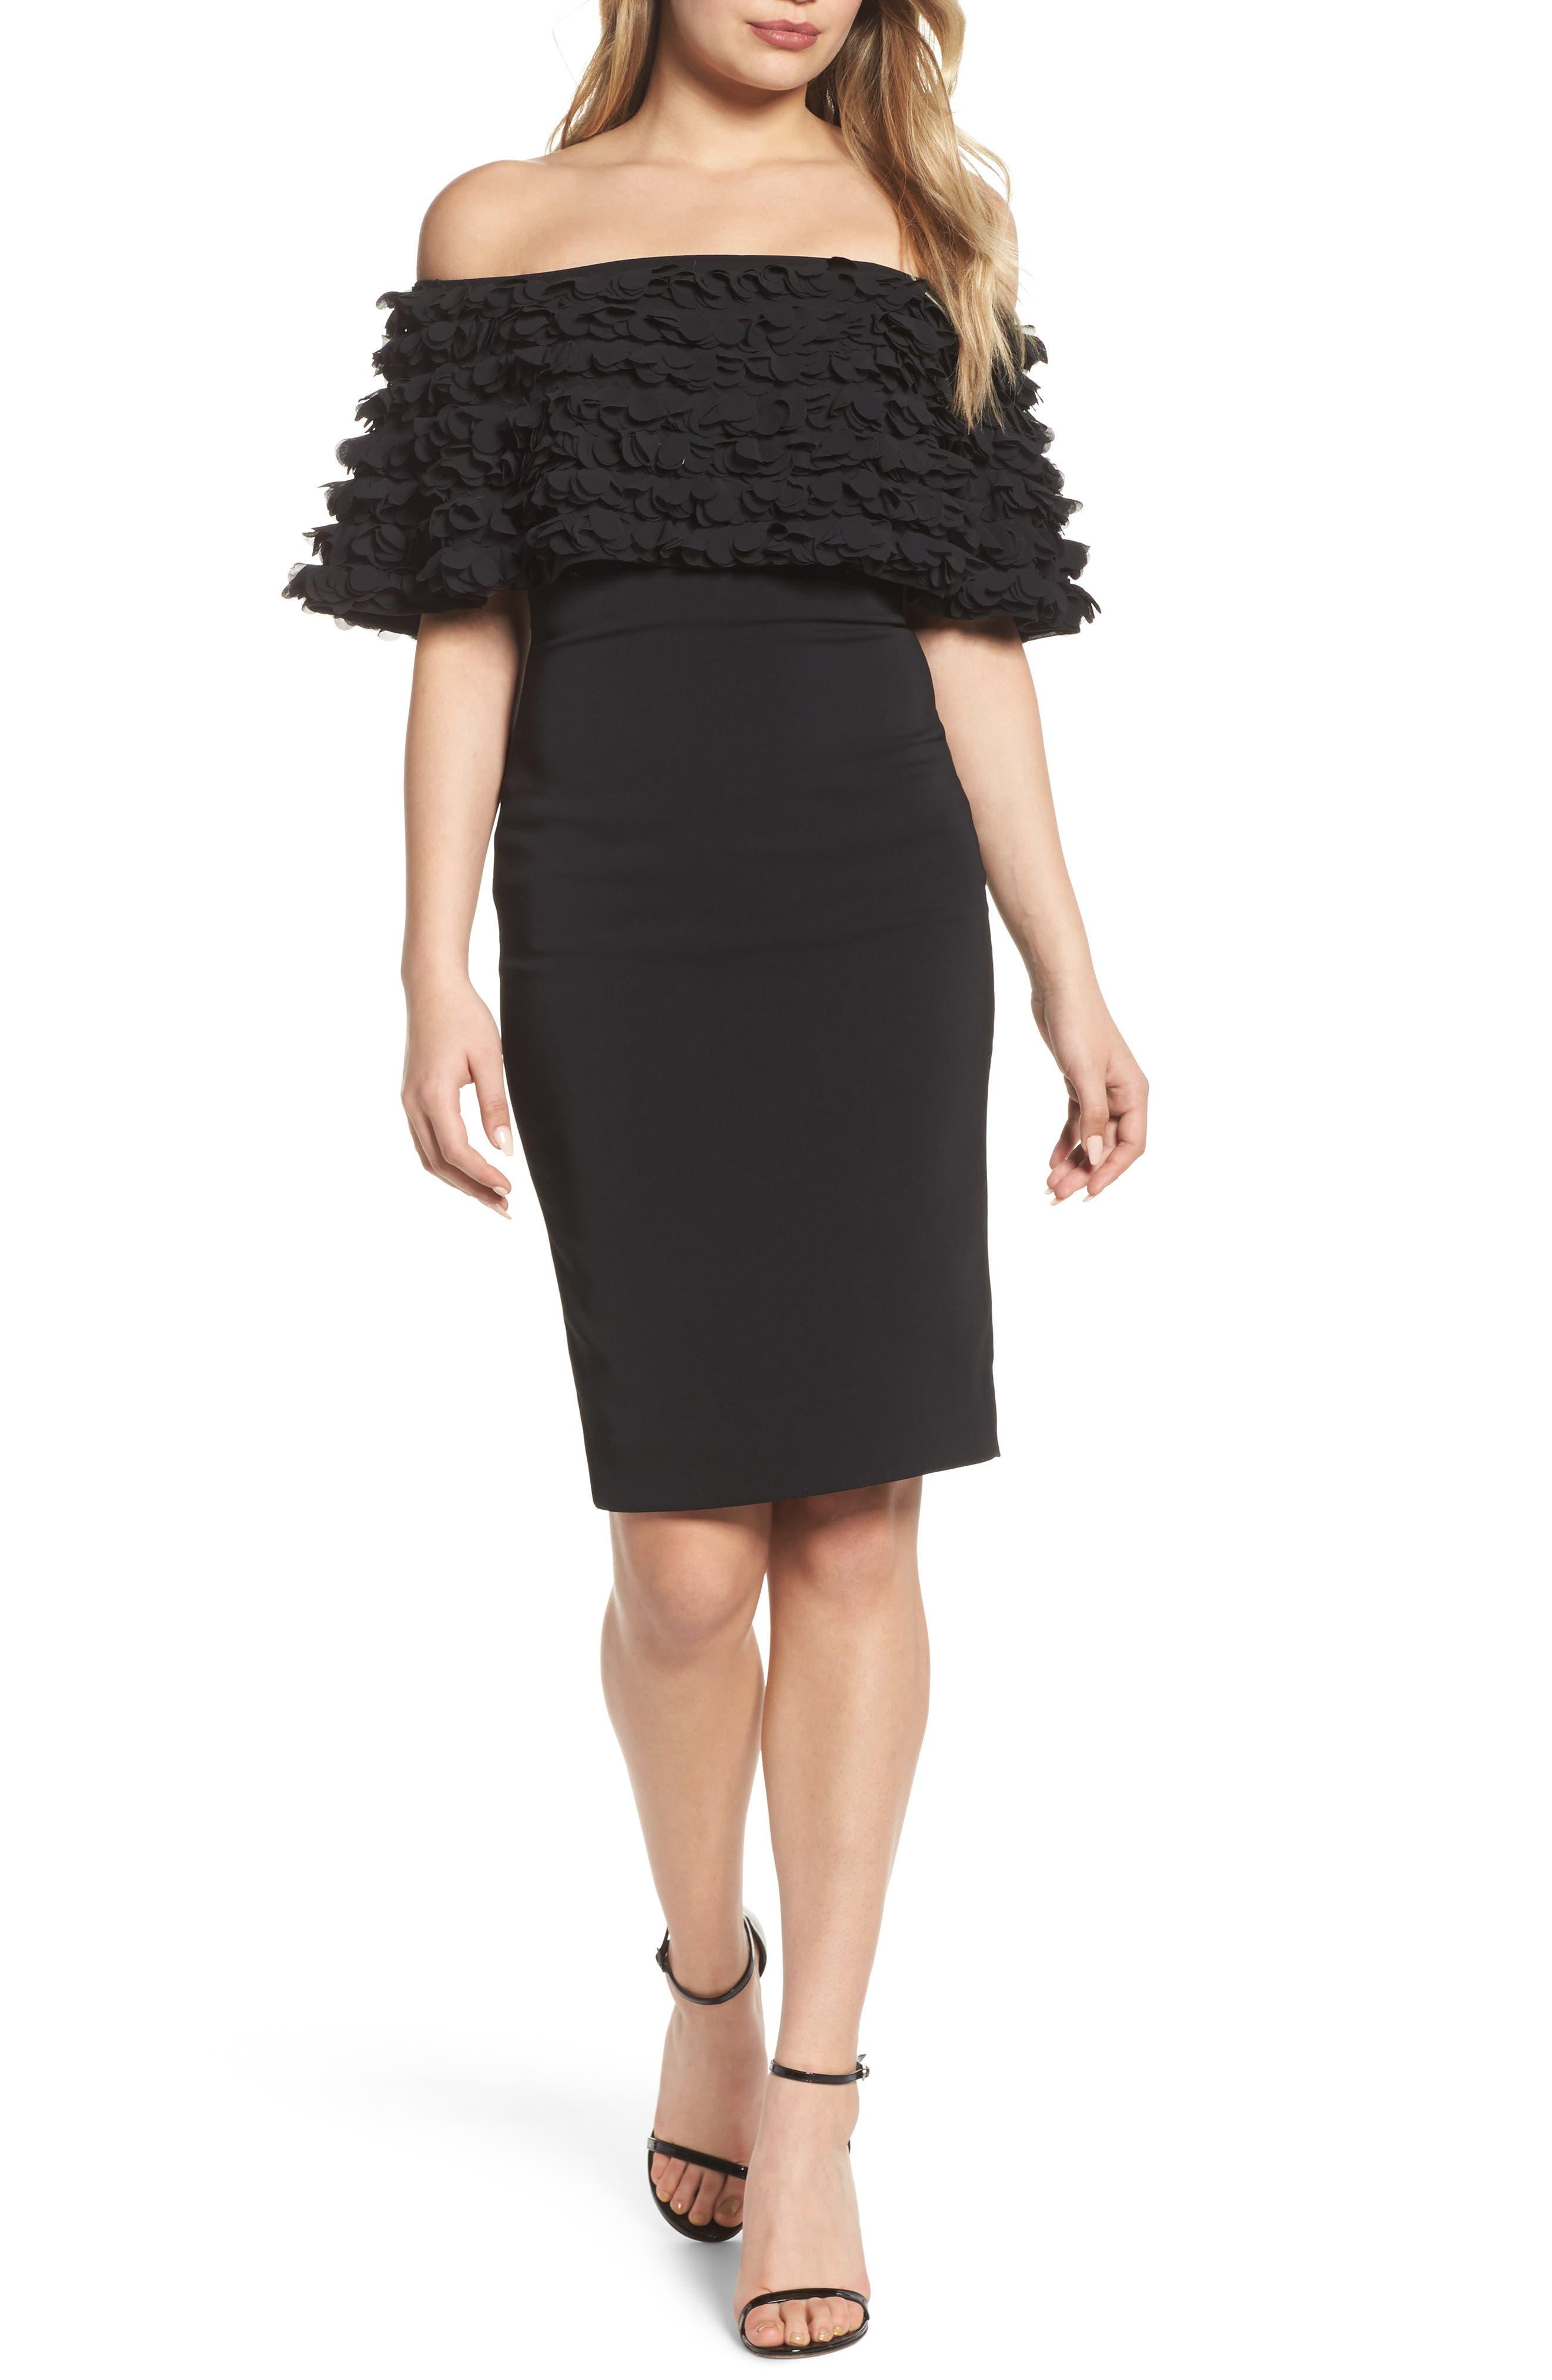 Alternate Image 1 Selected - Badgley Mischka Off the Shoulder Sheath Dress